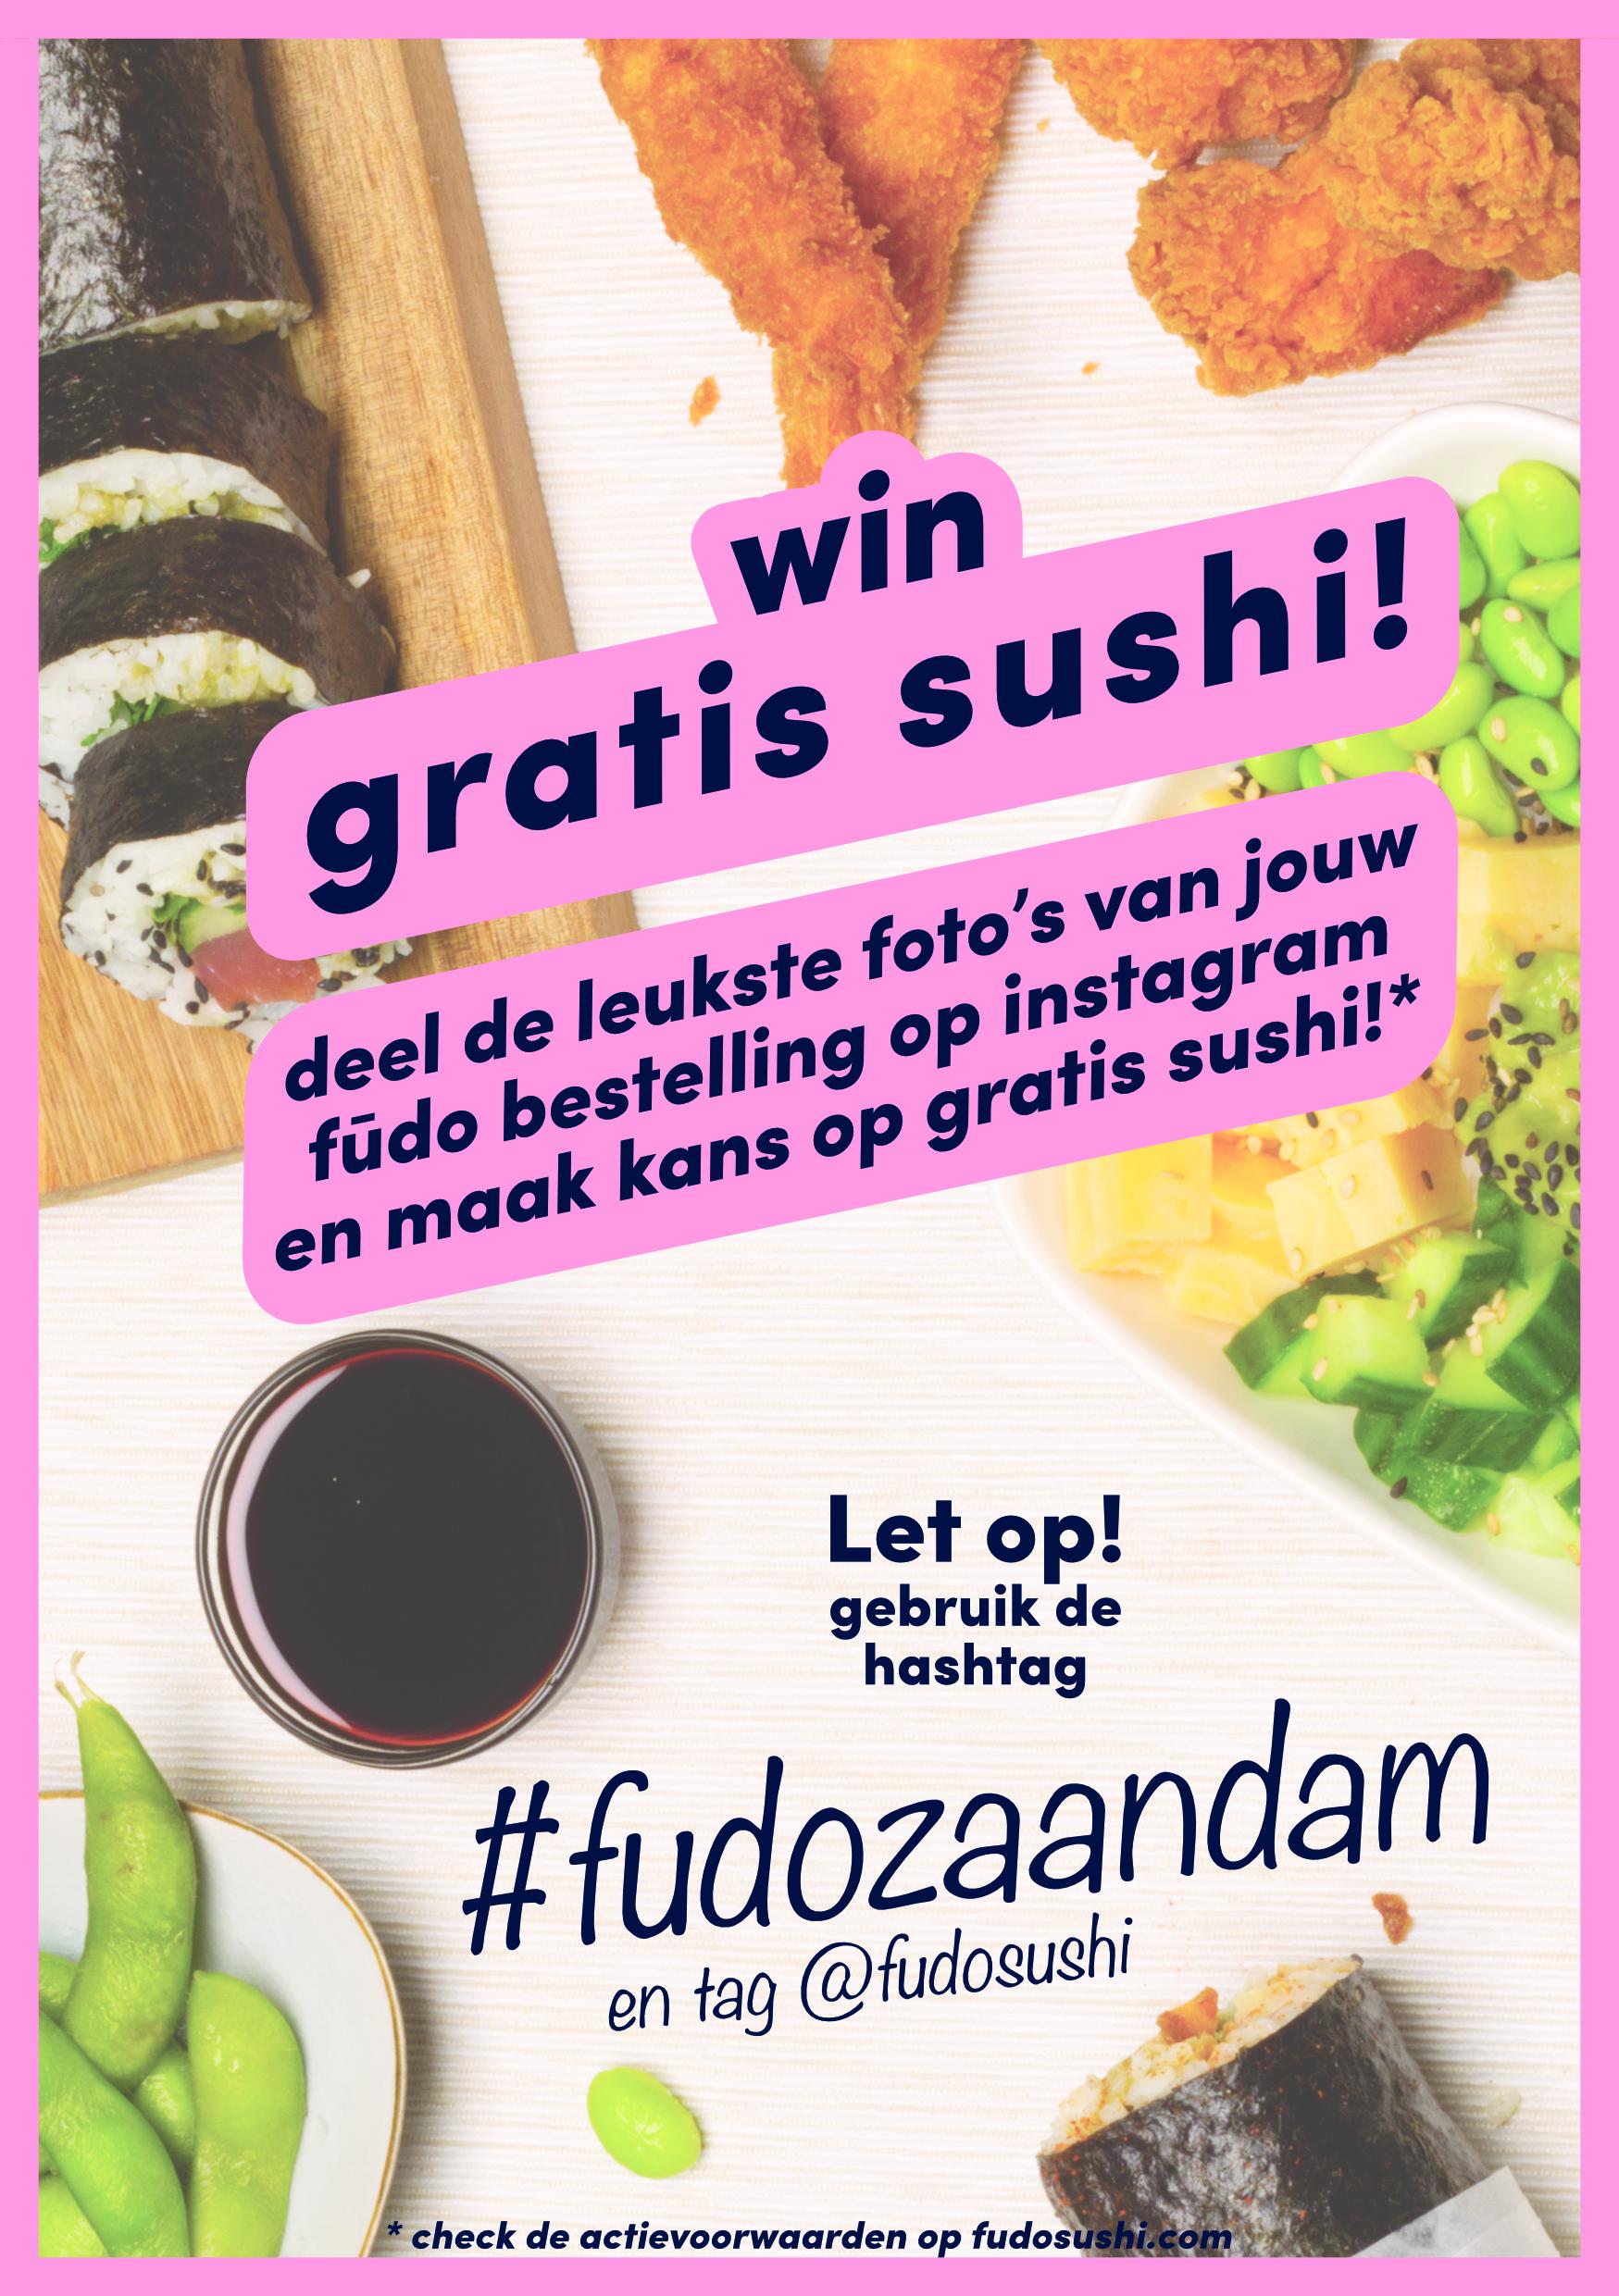 deel je foto, win gratis sushi!